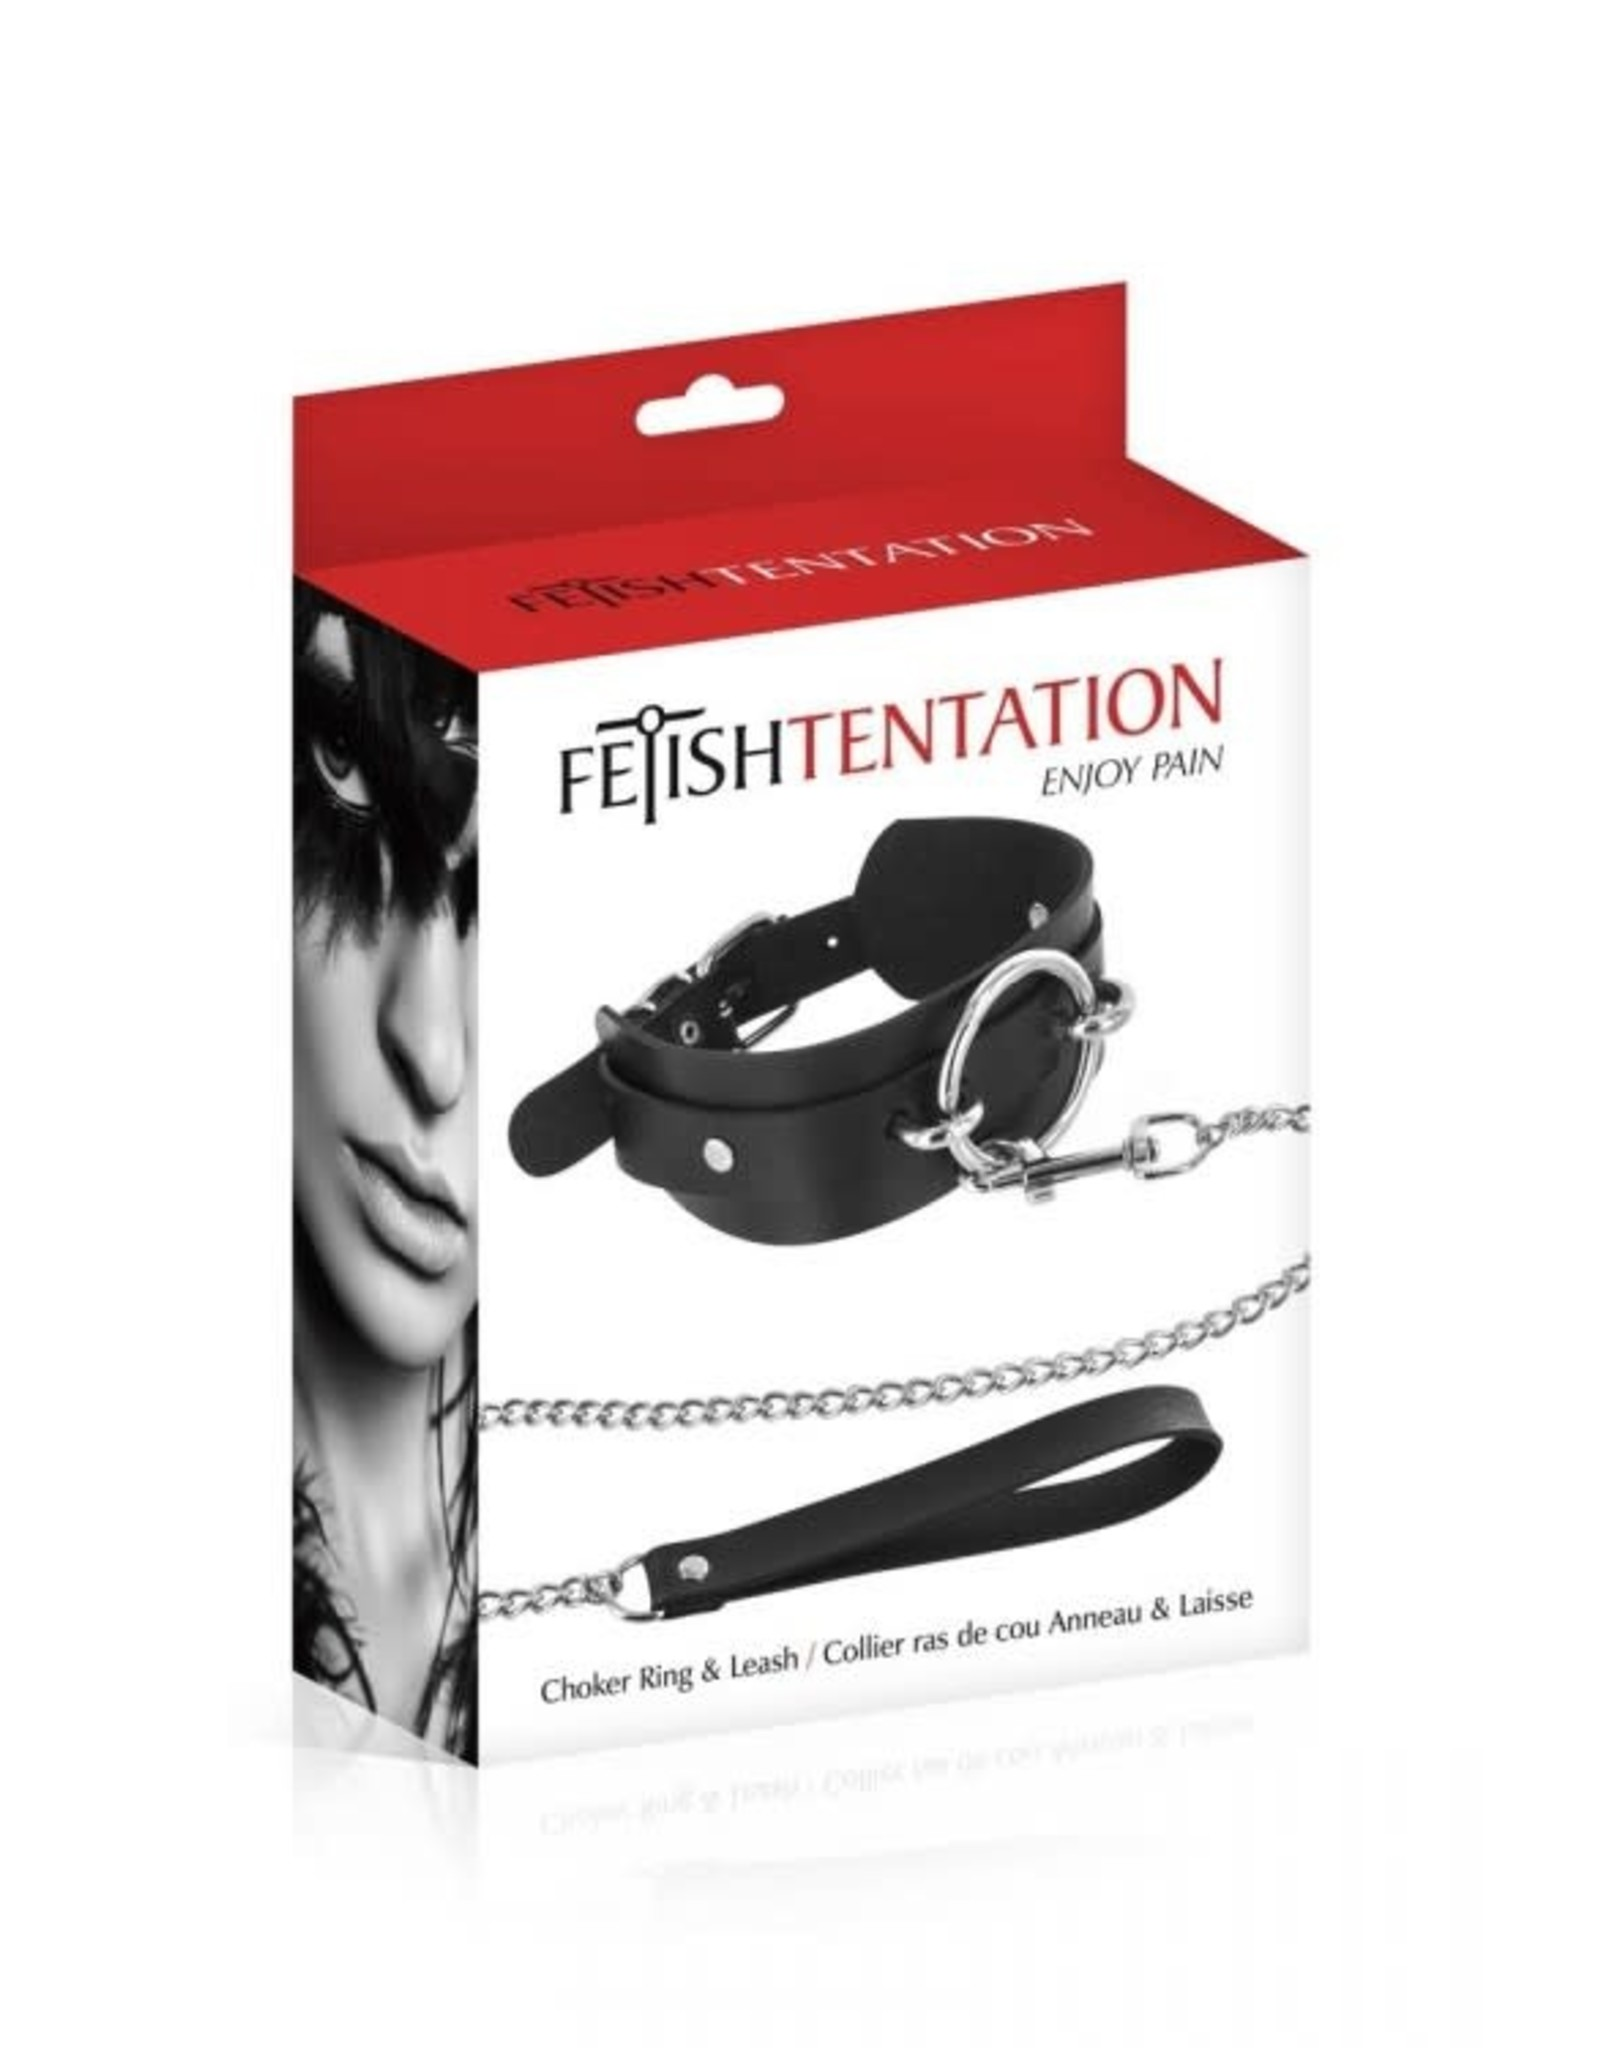 FETISH TENTATION - CHOKER O-RING & LEASH SET